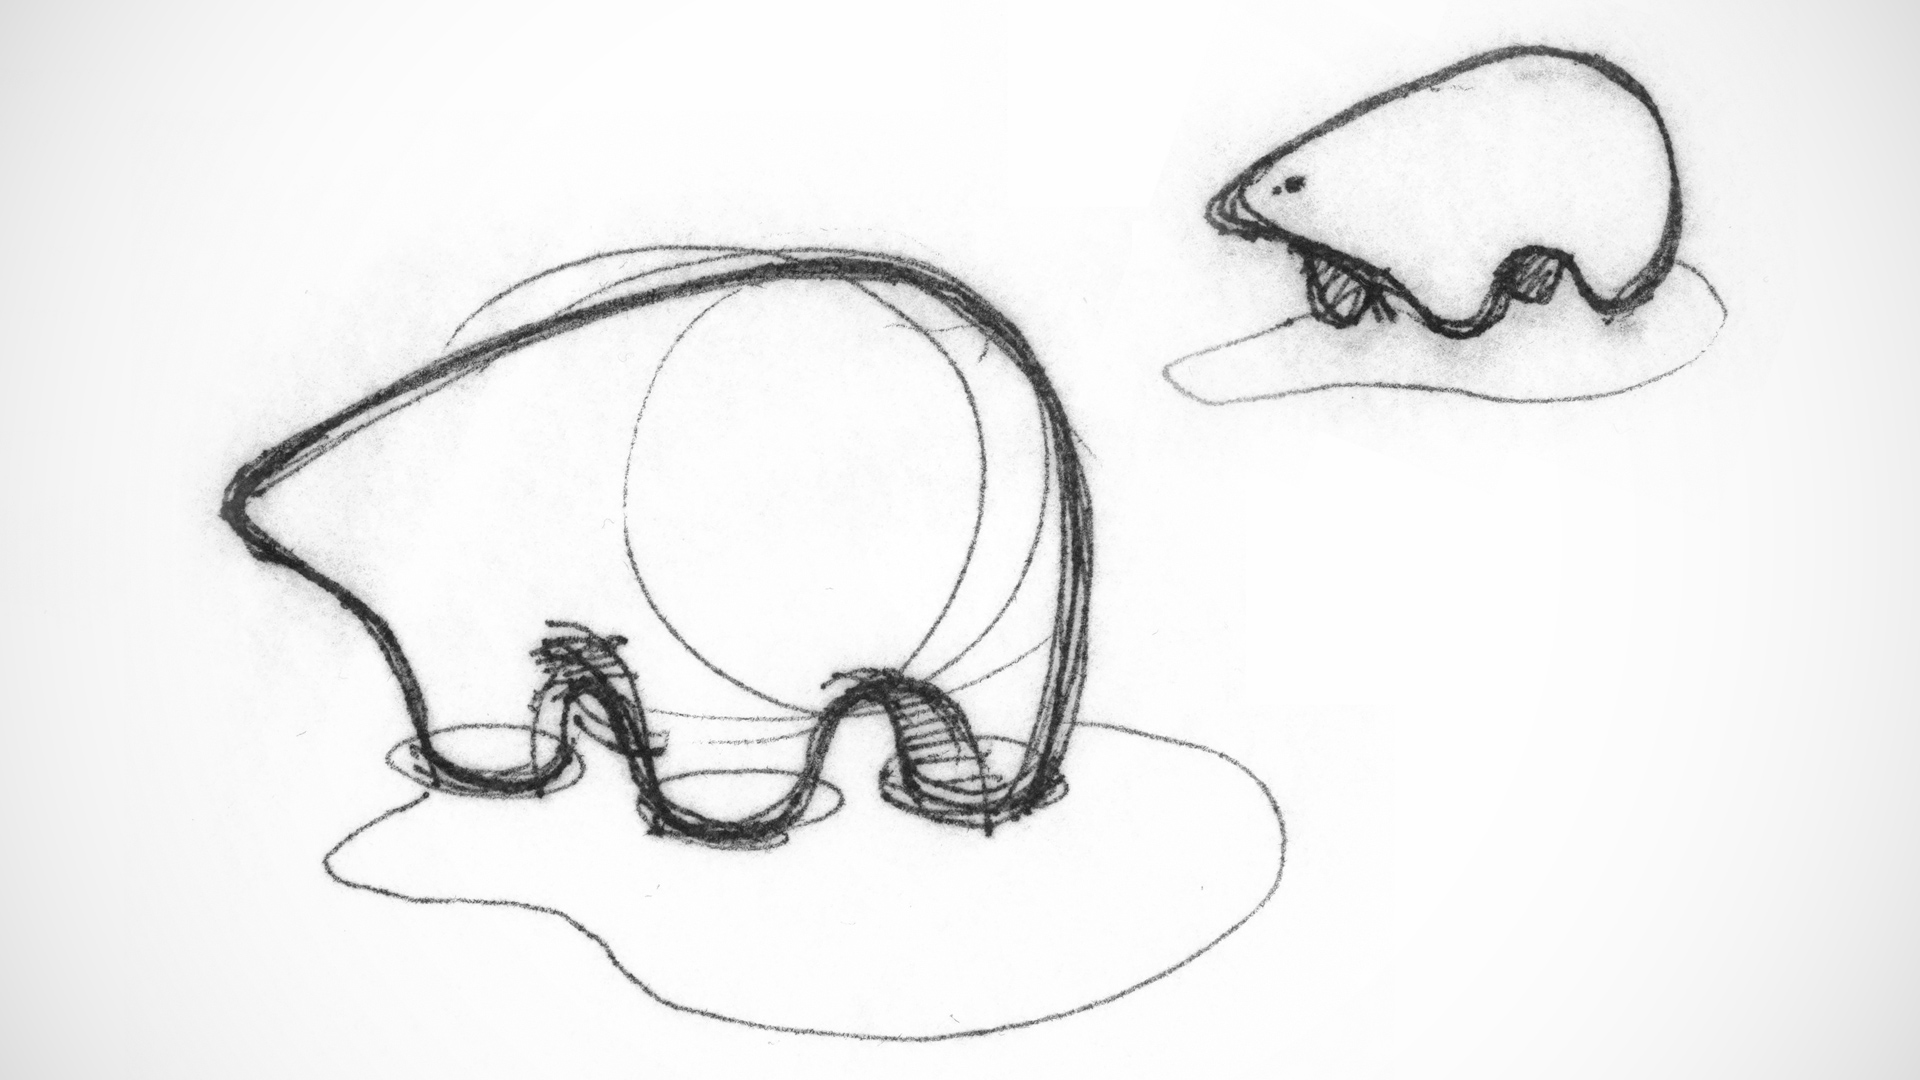 Umka-polar-bear-sketches_1600x900.jpg